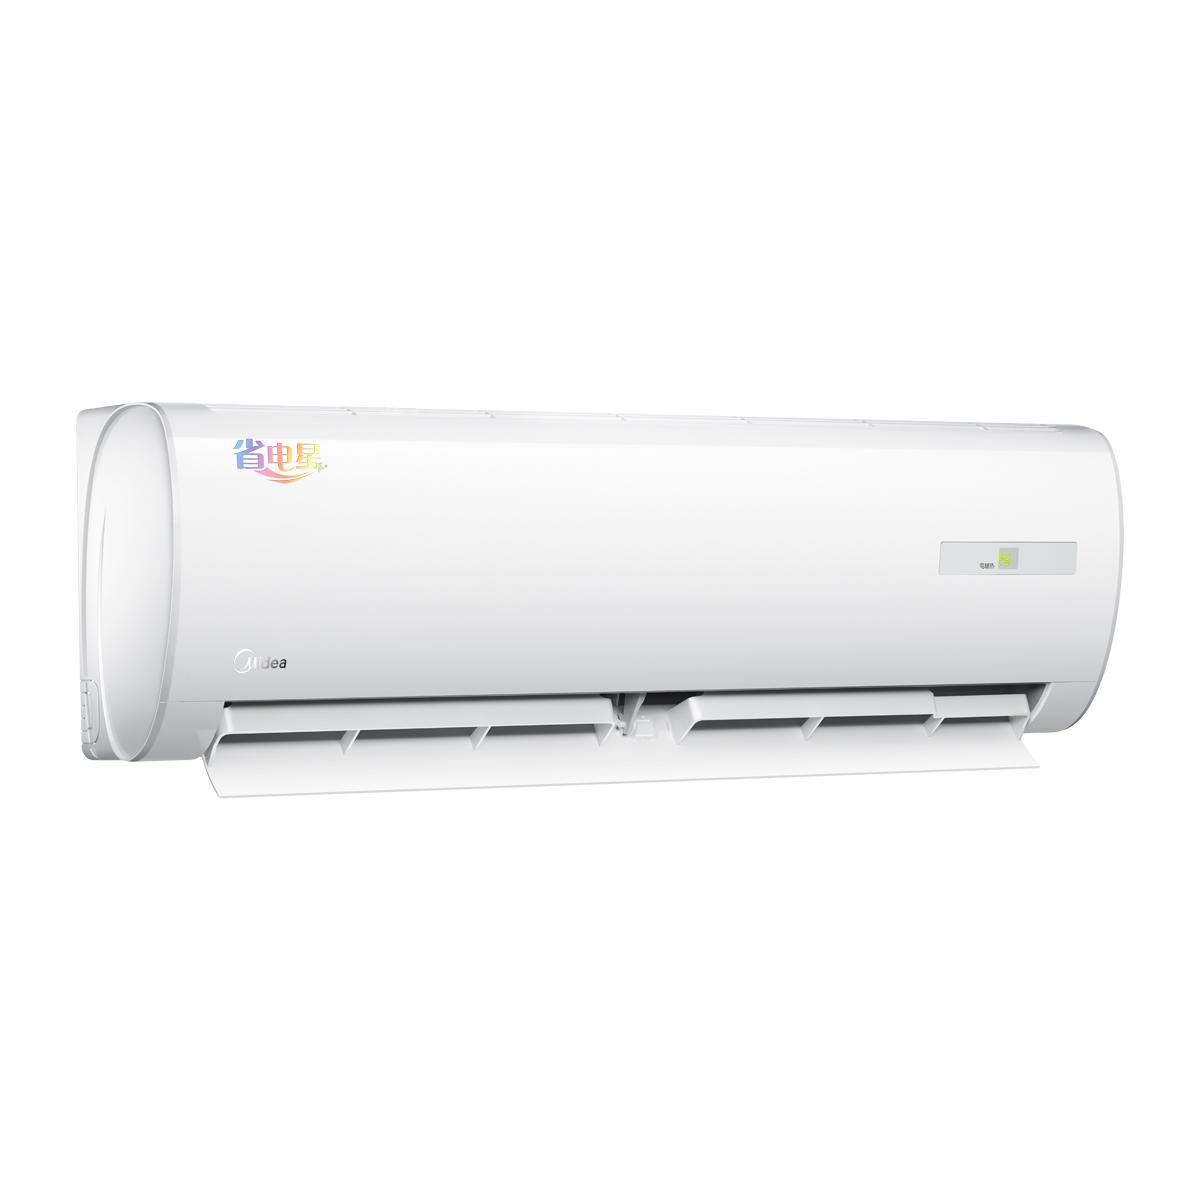 Midea/美的 KFR-35GW/DY-DA400(D2)家用空调套机 说明书.pdf